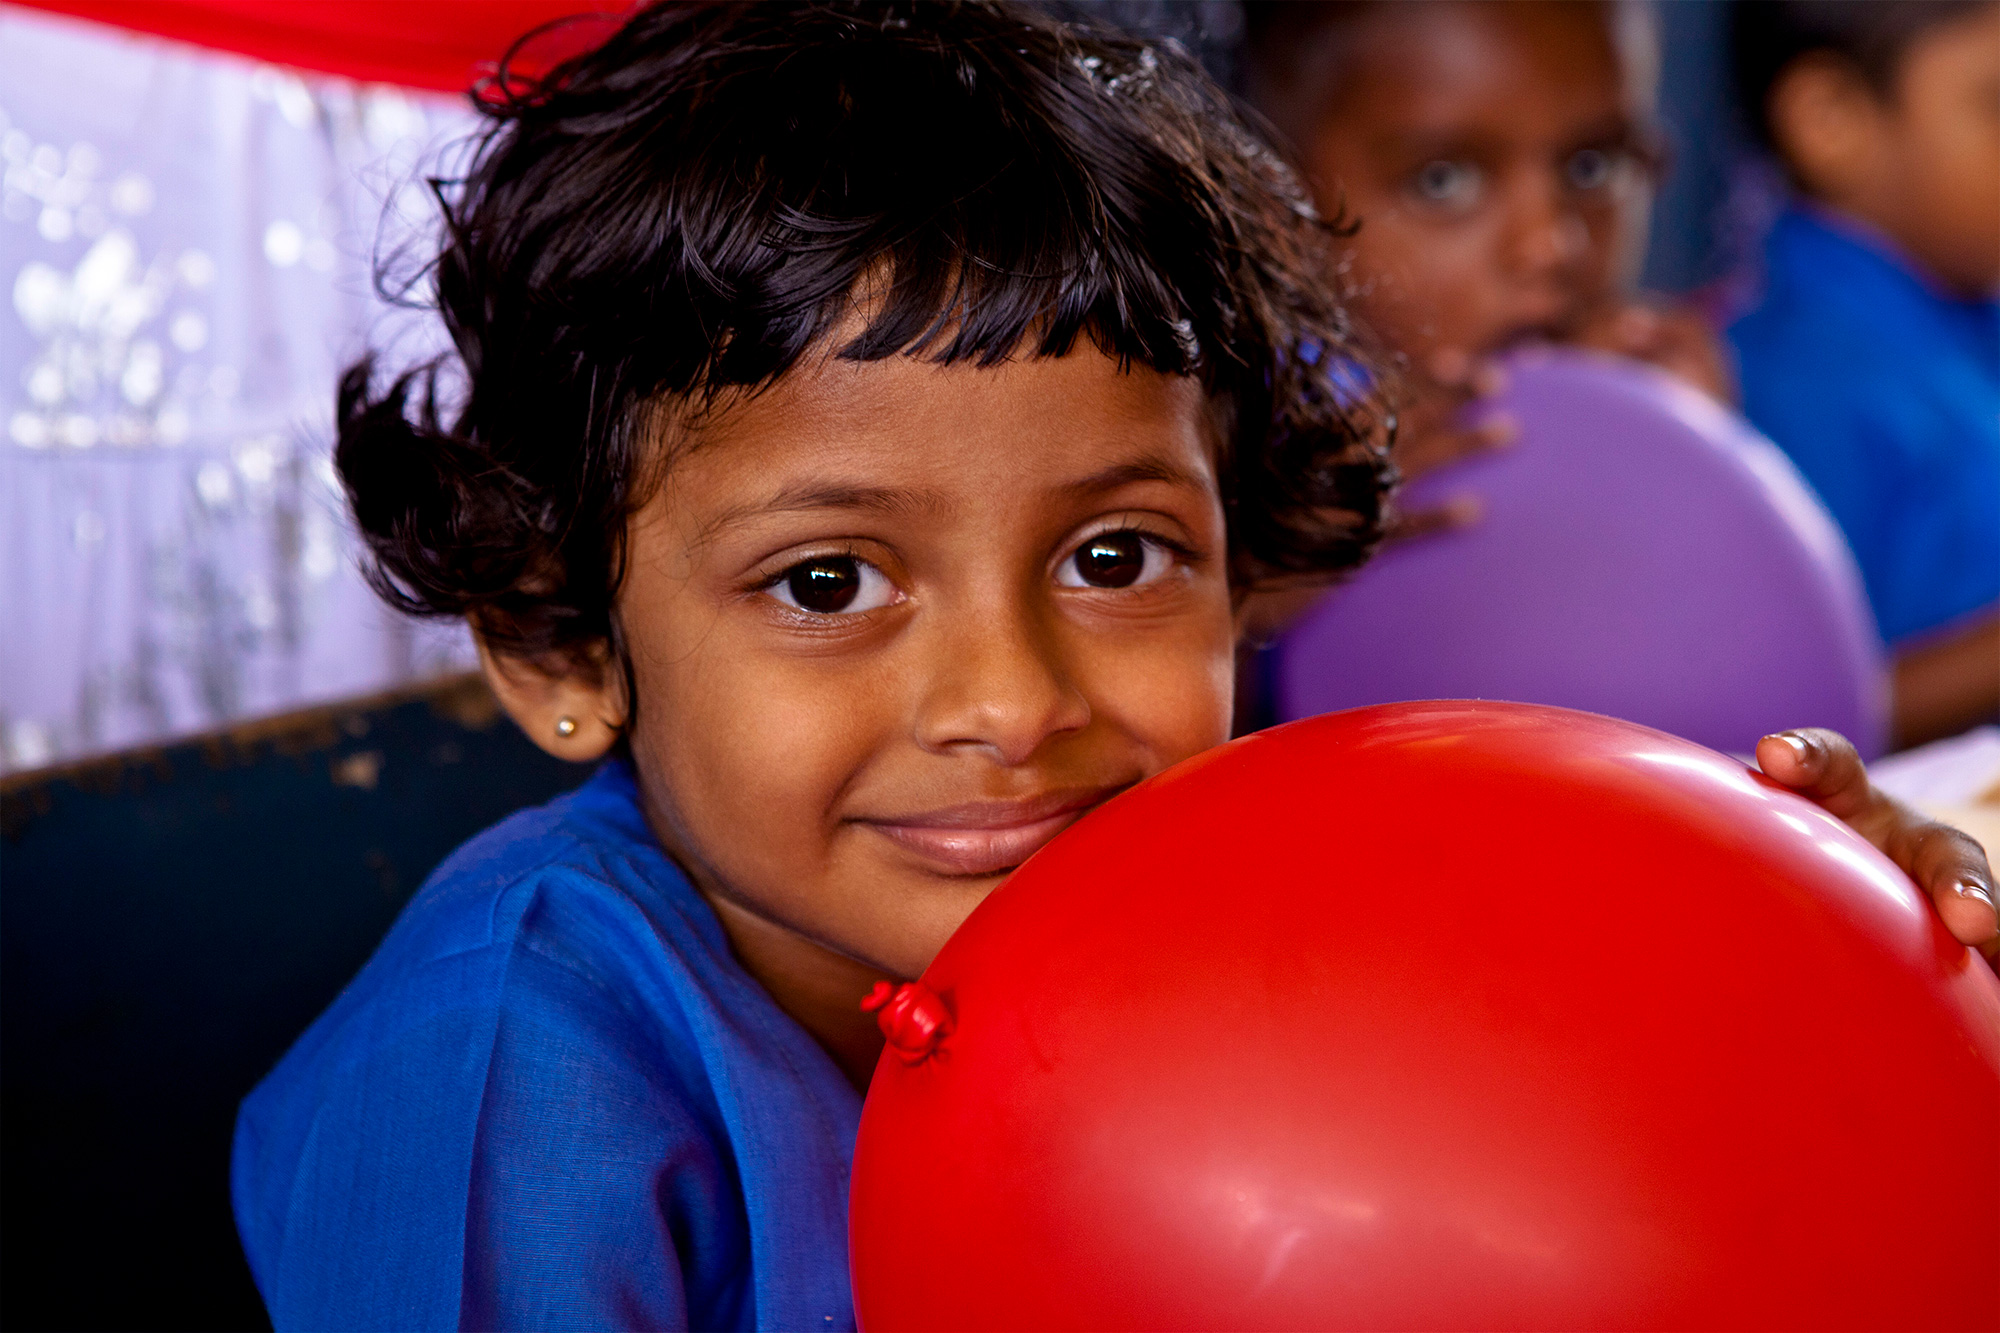 Vorschulkind in der one world foundation in Ahungalla, Sri Lanka, Foto: Thomas Wirthensohn